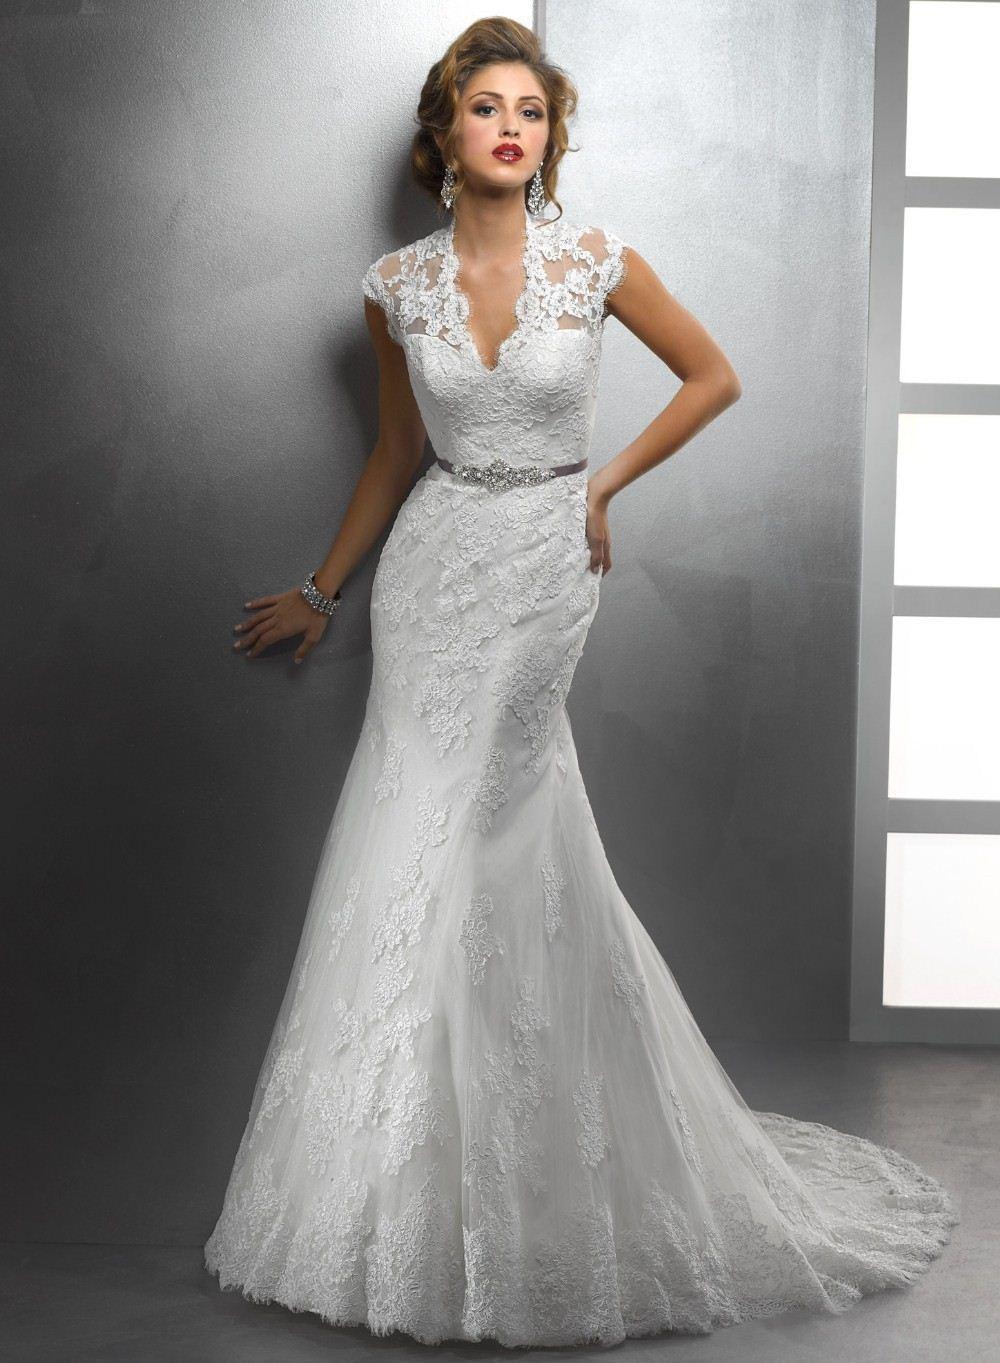 2017 Vestidos Elegant Design V Neck Cap Sleeve Appliqued Mermaid Deep Wedding Dresses